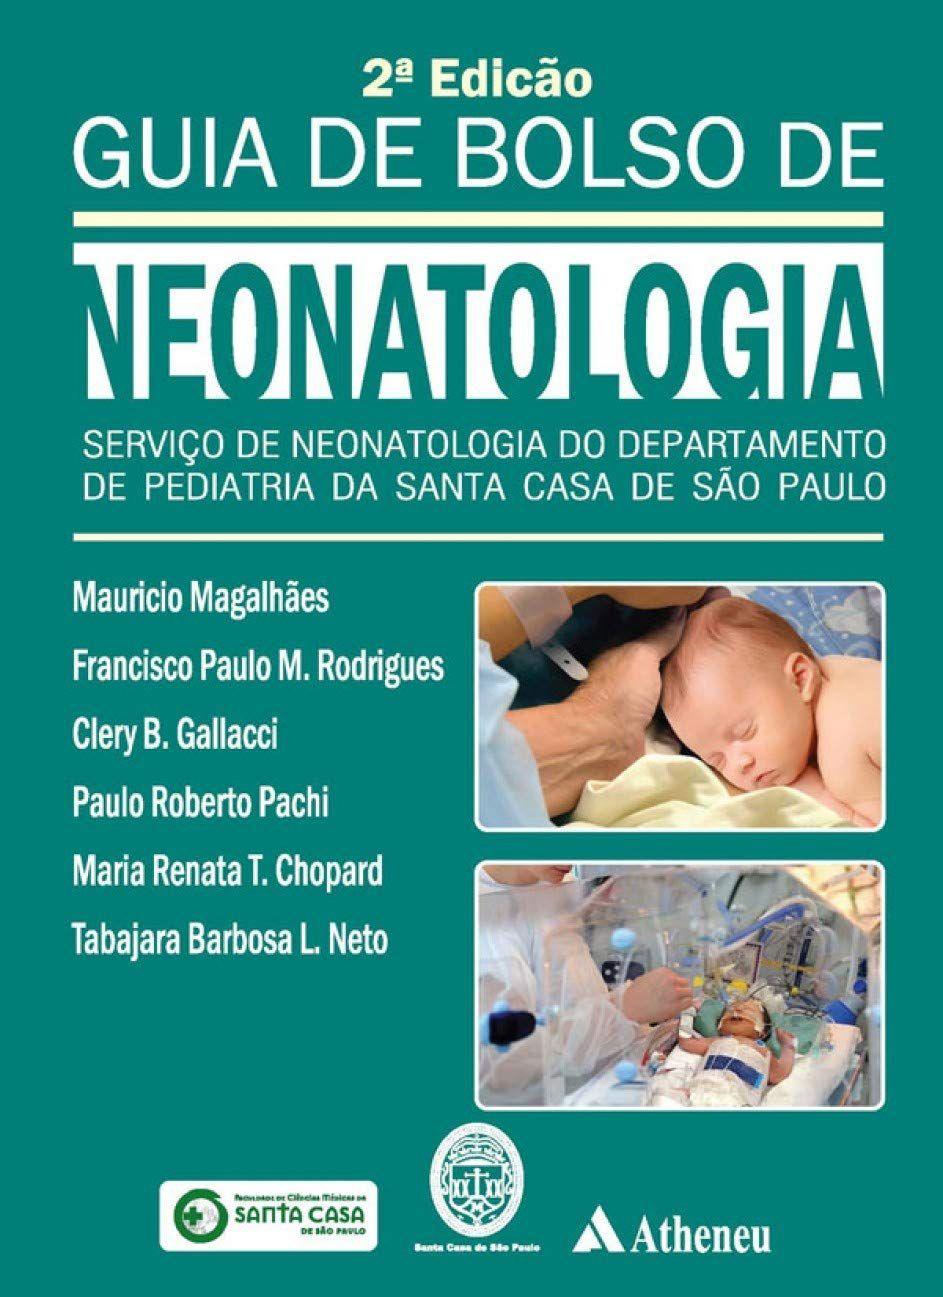 GUIA DE BOLSO NEONATOLOGIA